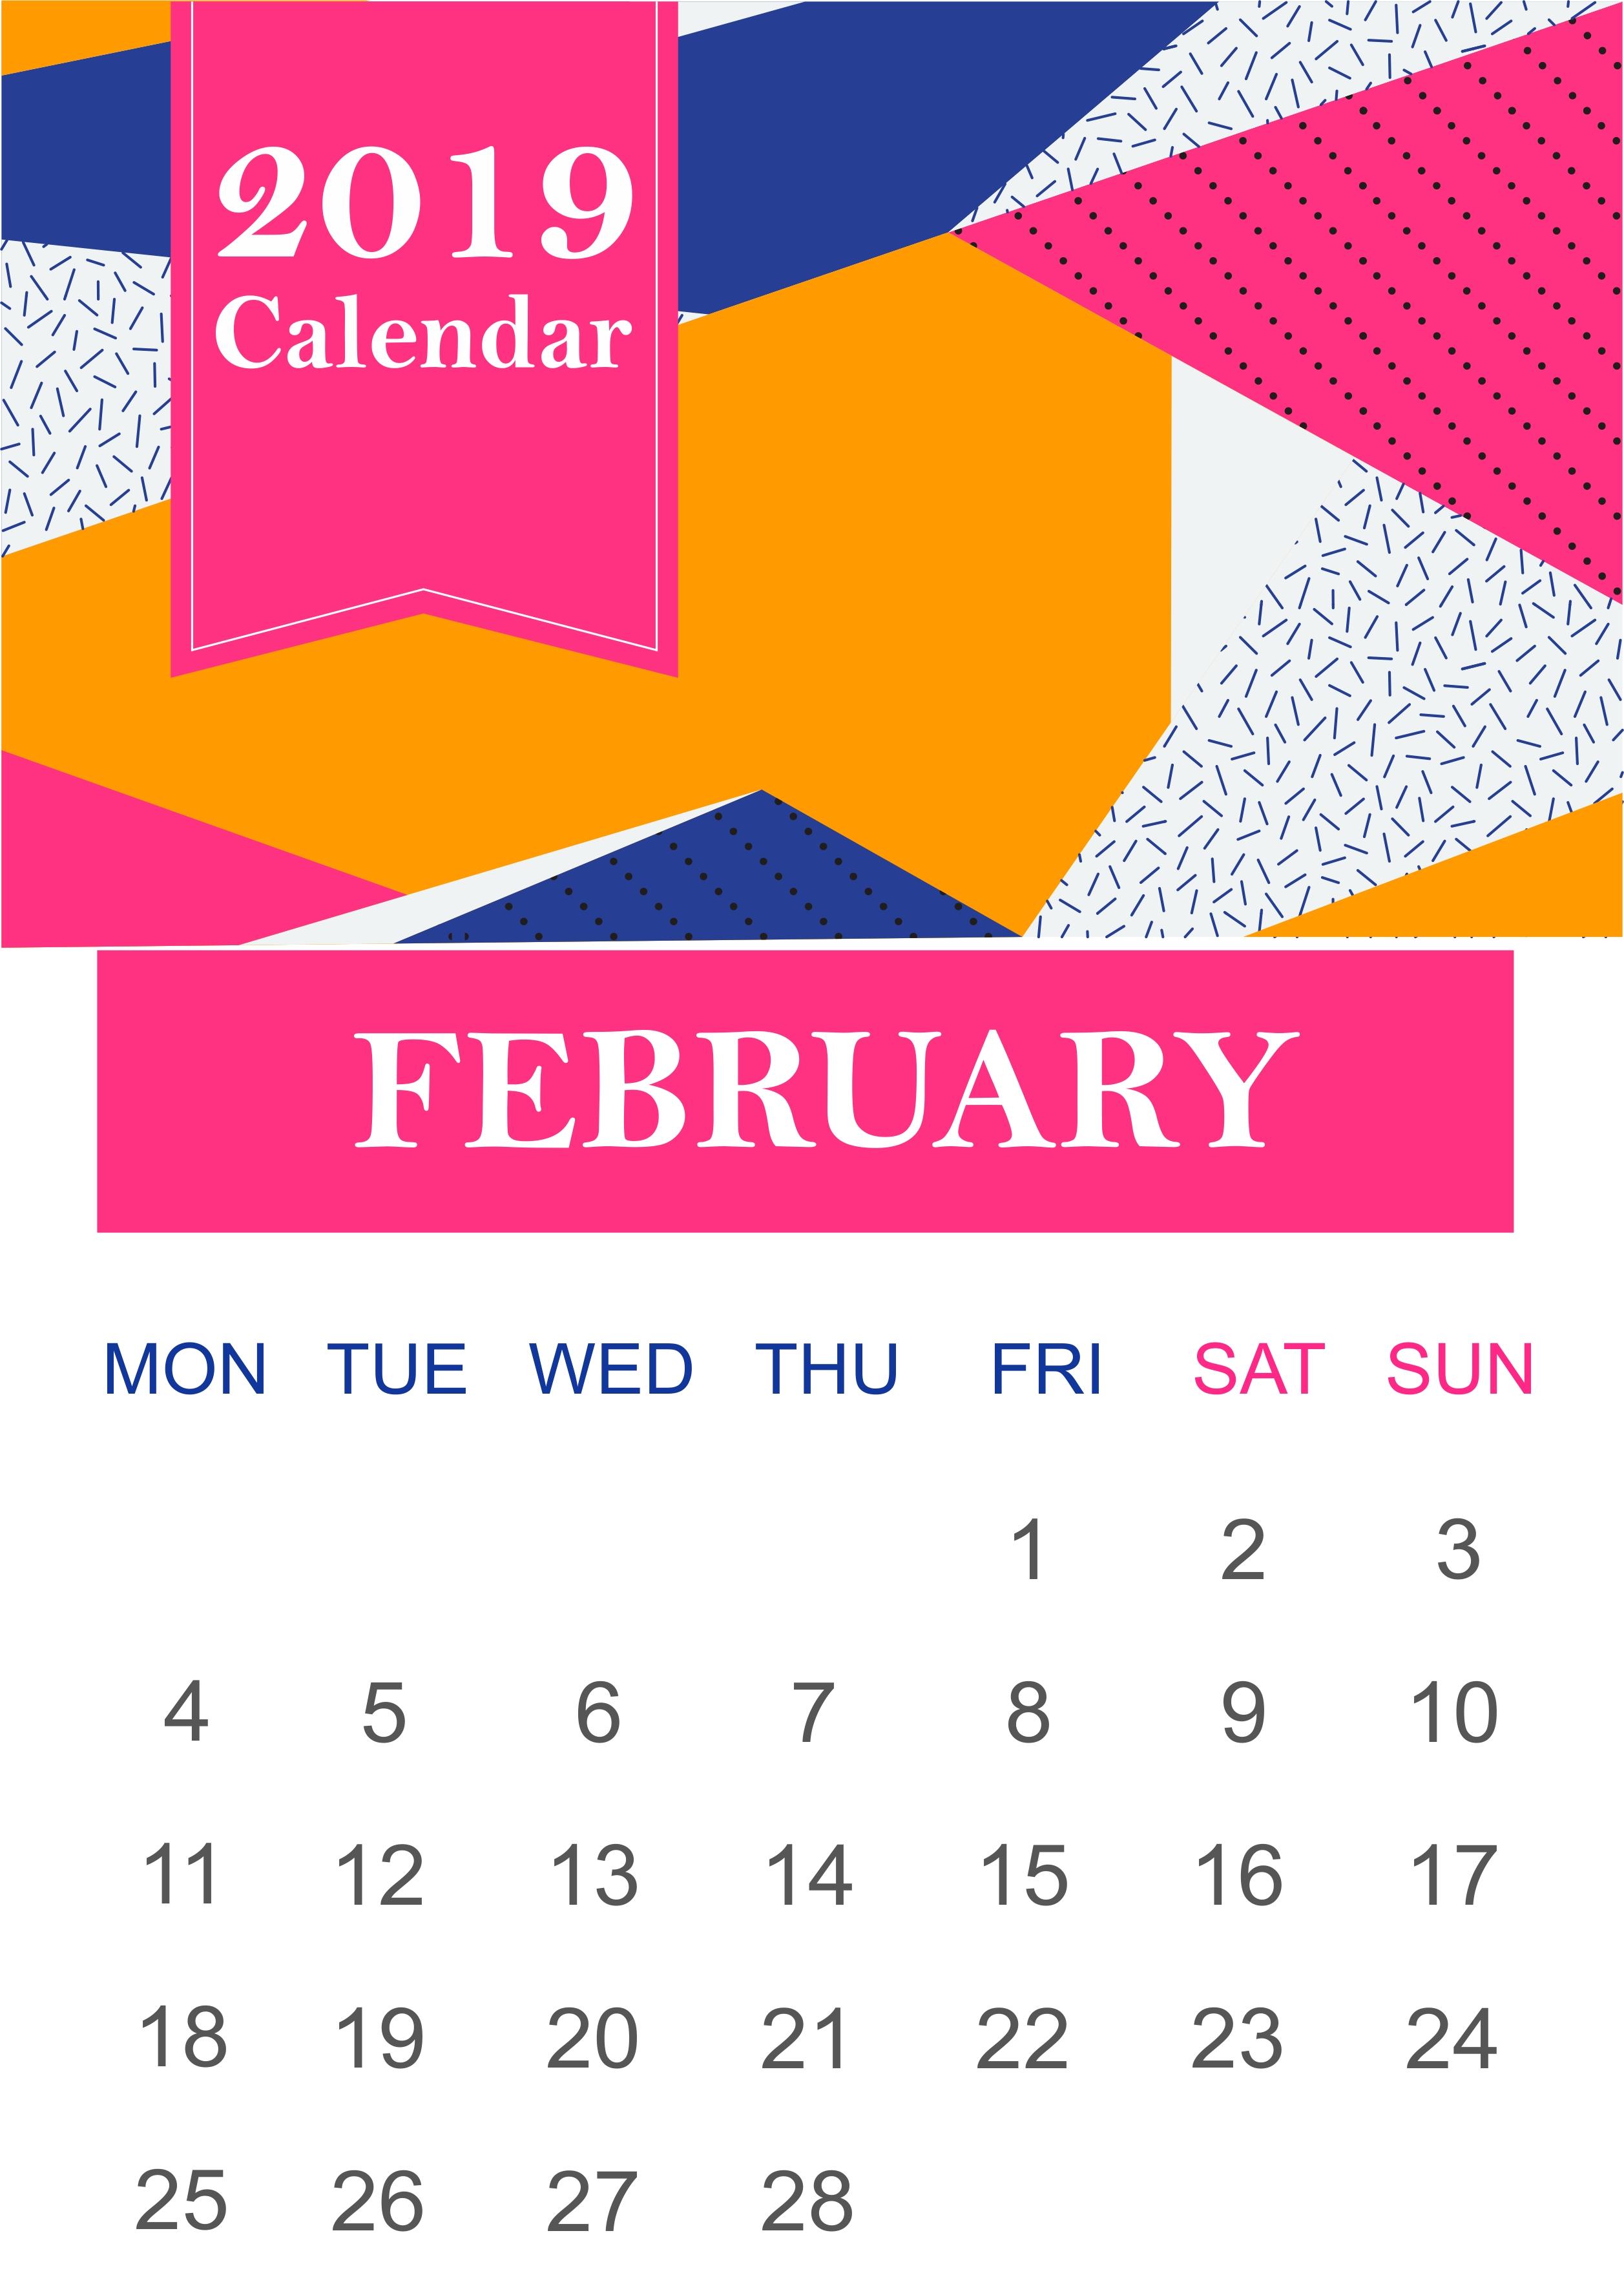 Editable Calendar February 2019 Template #februarycalendar Calendar Feb 9 2019